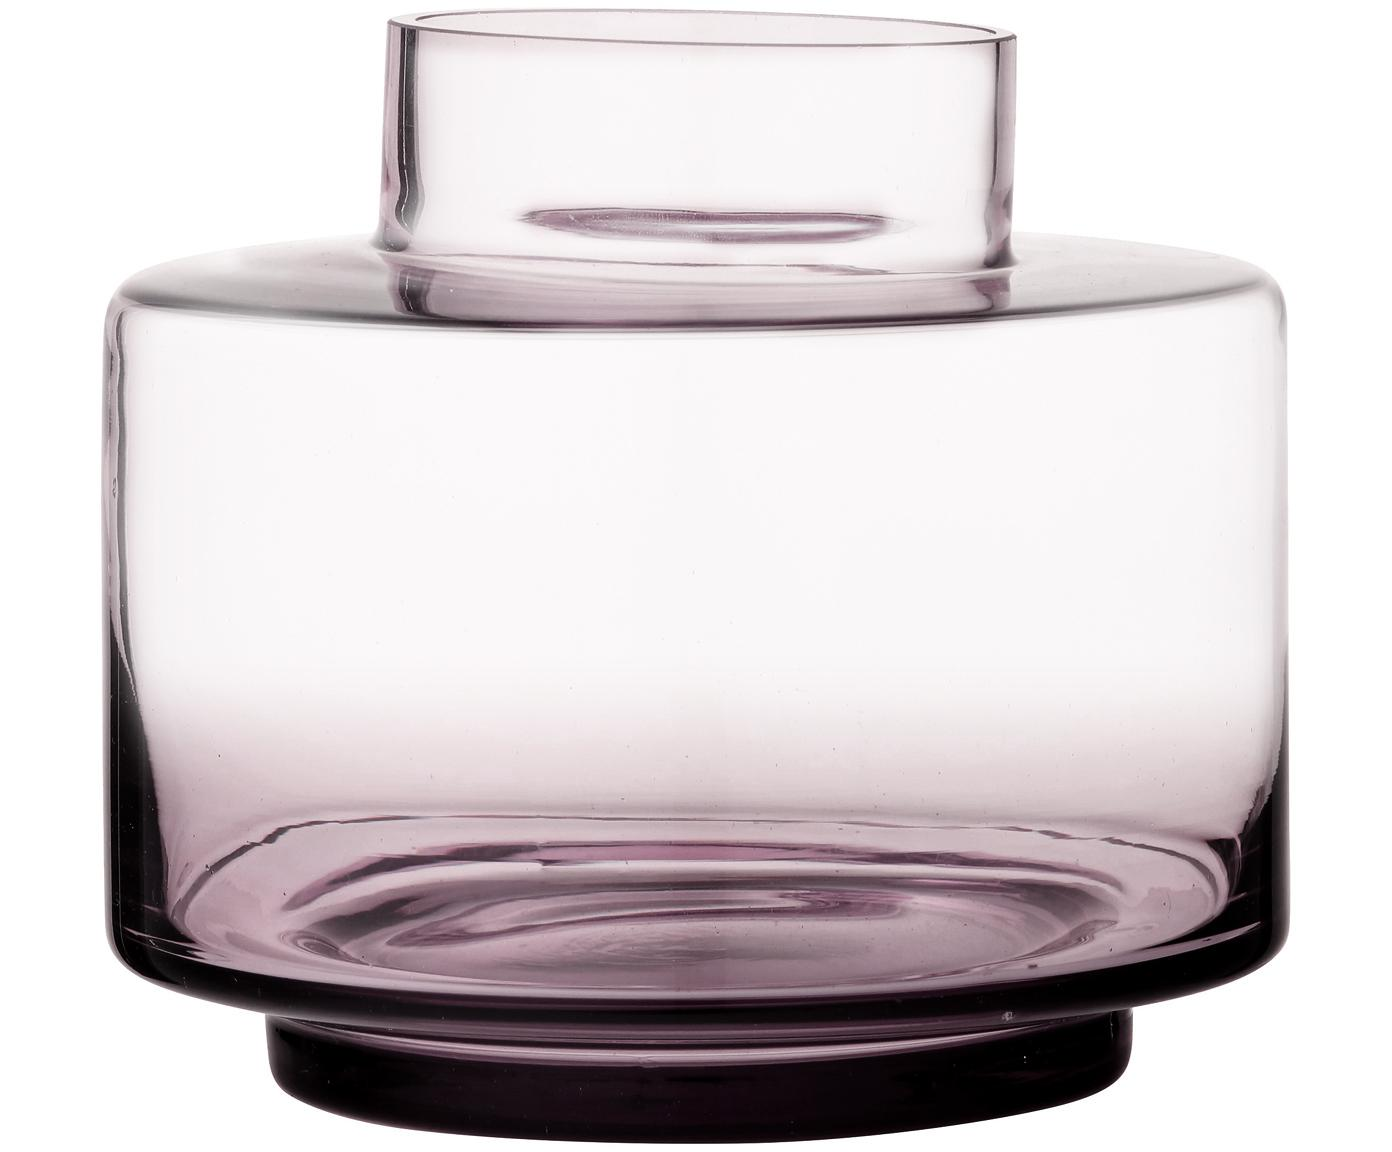 Vaso in vetro soffiato Hedria, Vetro, Rosa, trasparente, Ø 18 x Alt. 16 cm